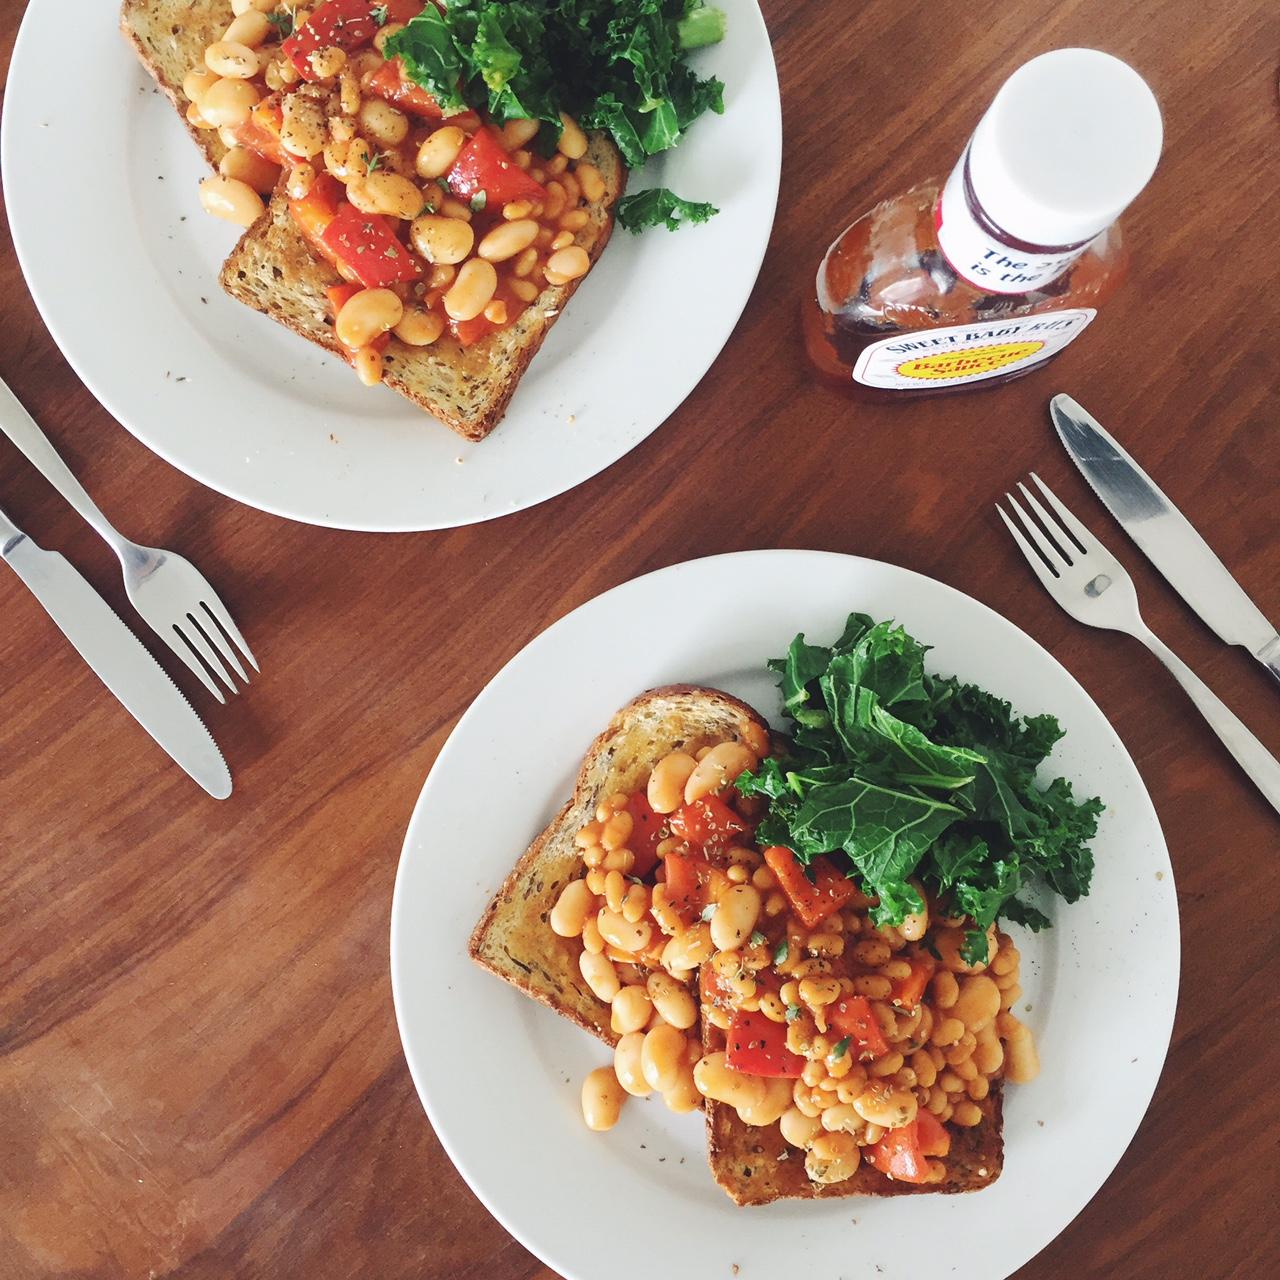 Posh beans on toast